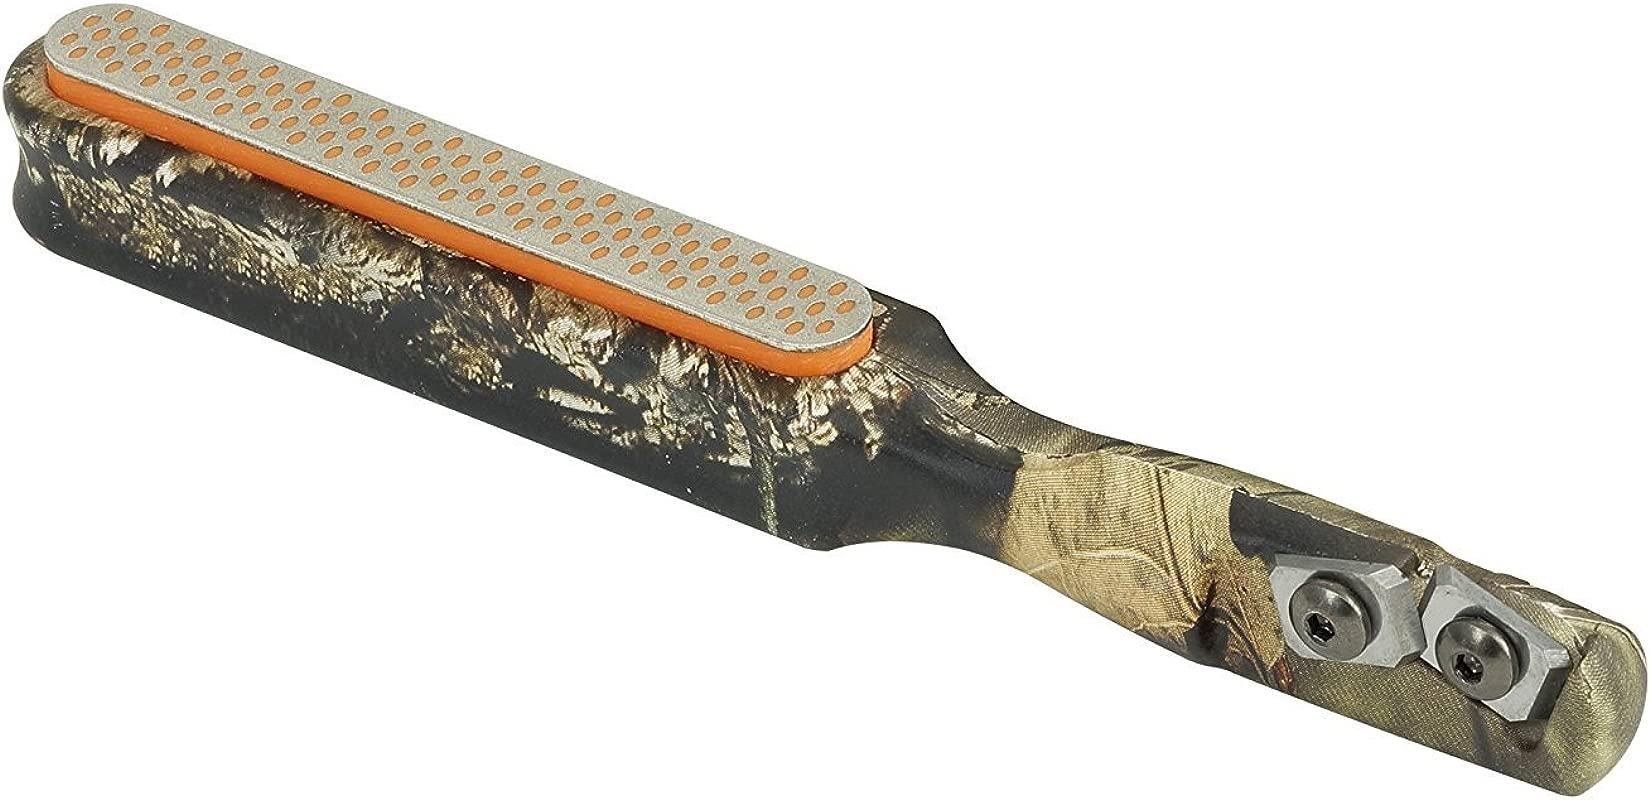 Smith S Edge Stick Knife And Broadhead Sharpener Mossy Oak 50549 Camo